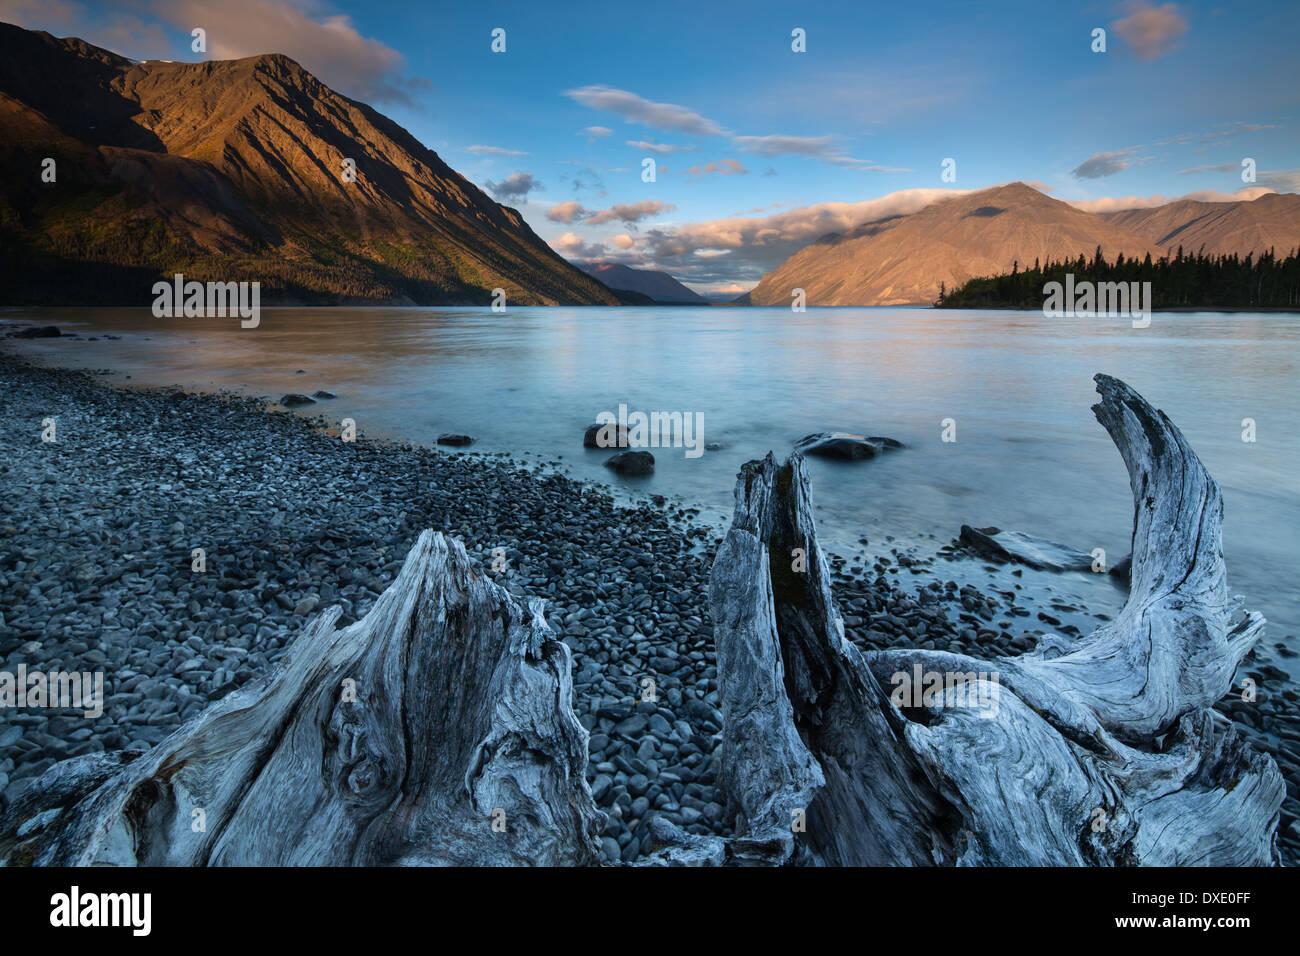 Kathleen Lake all'alba, Parco Nazionale Kluane, Yukon Territori, Canada Immagini Stock